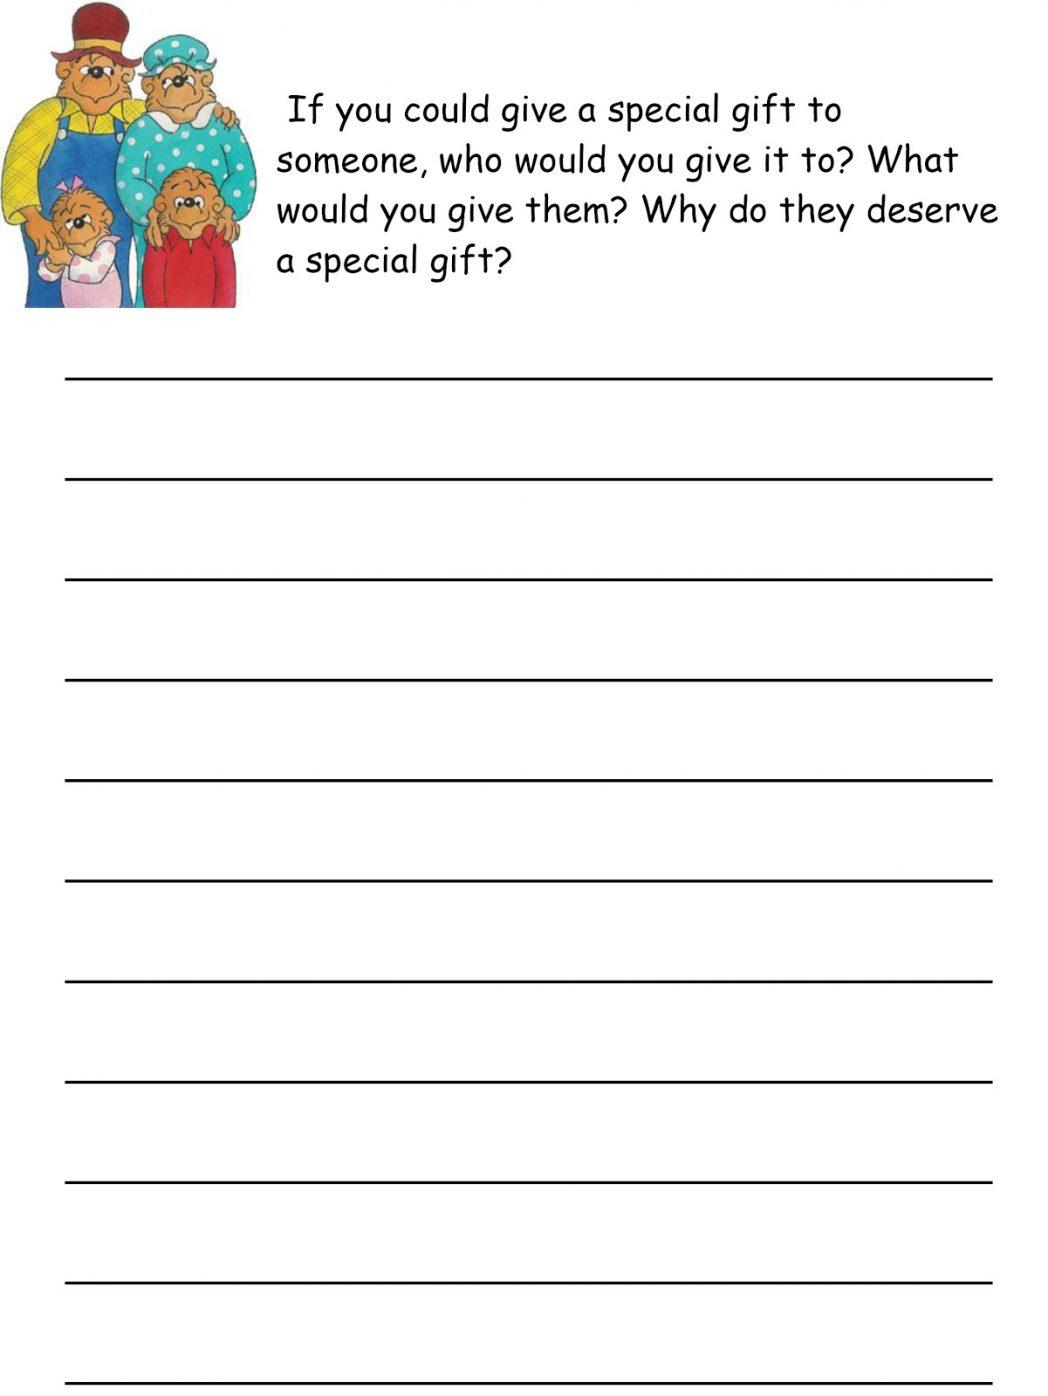 Grade 1 Writing Worksheets Tutore